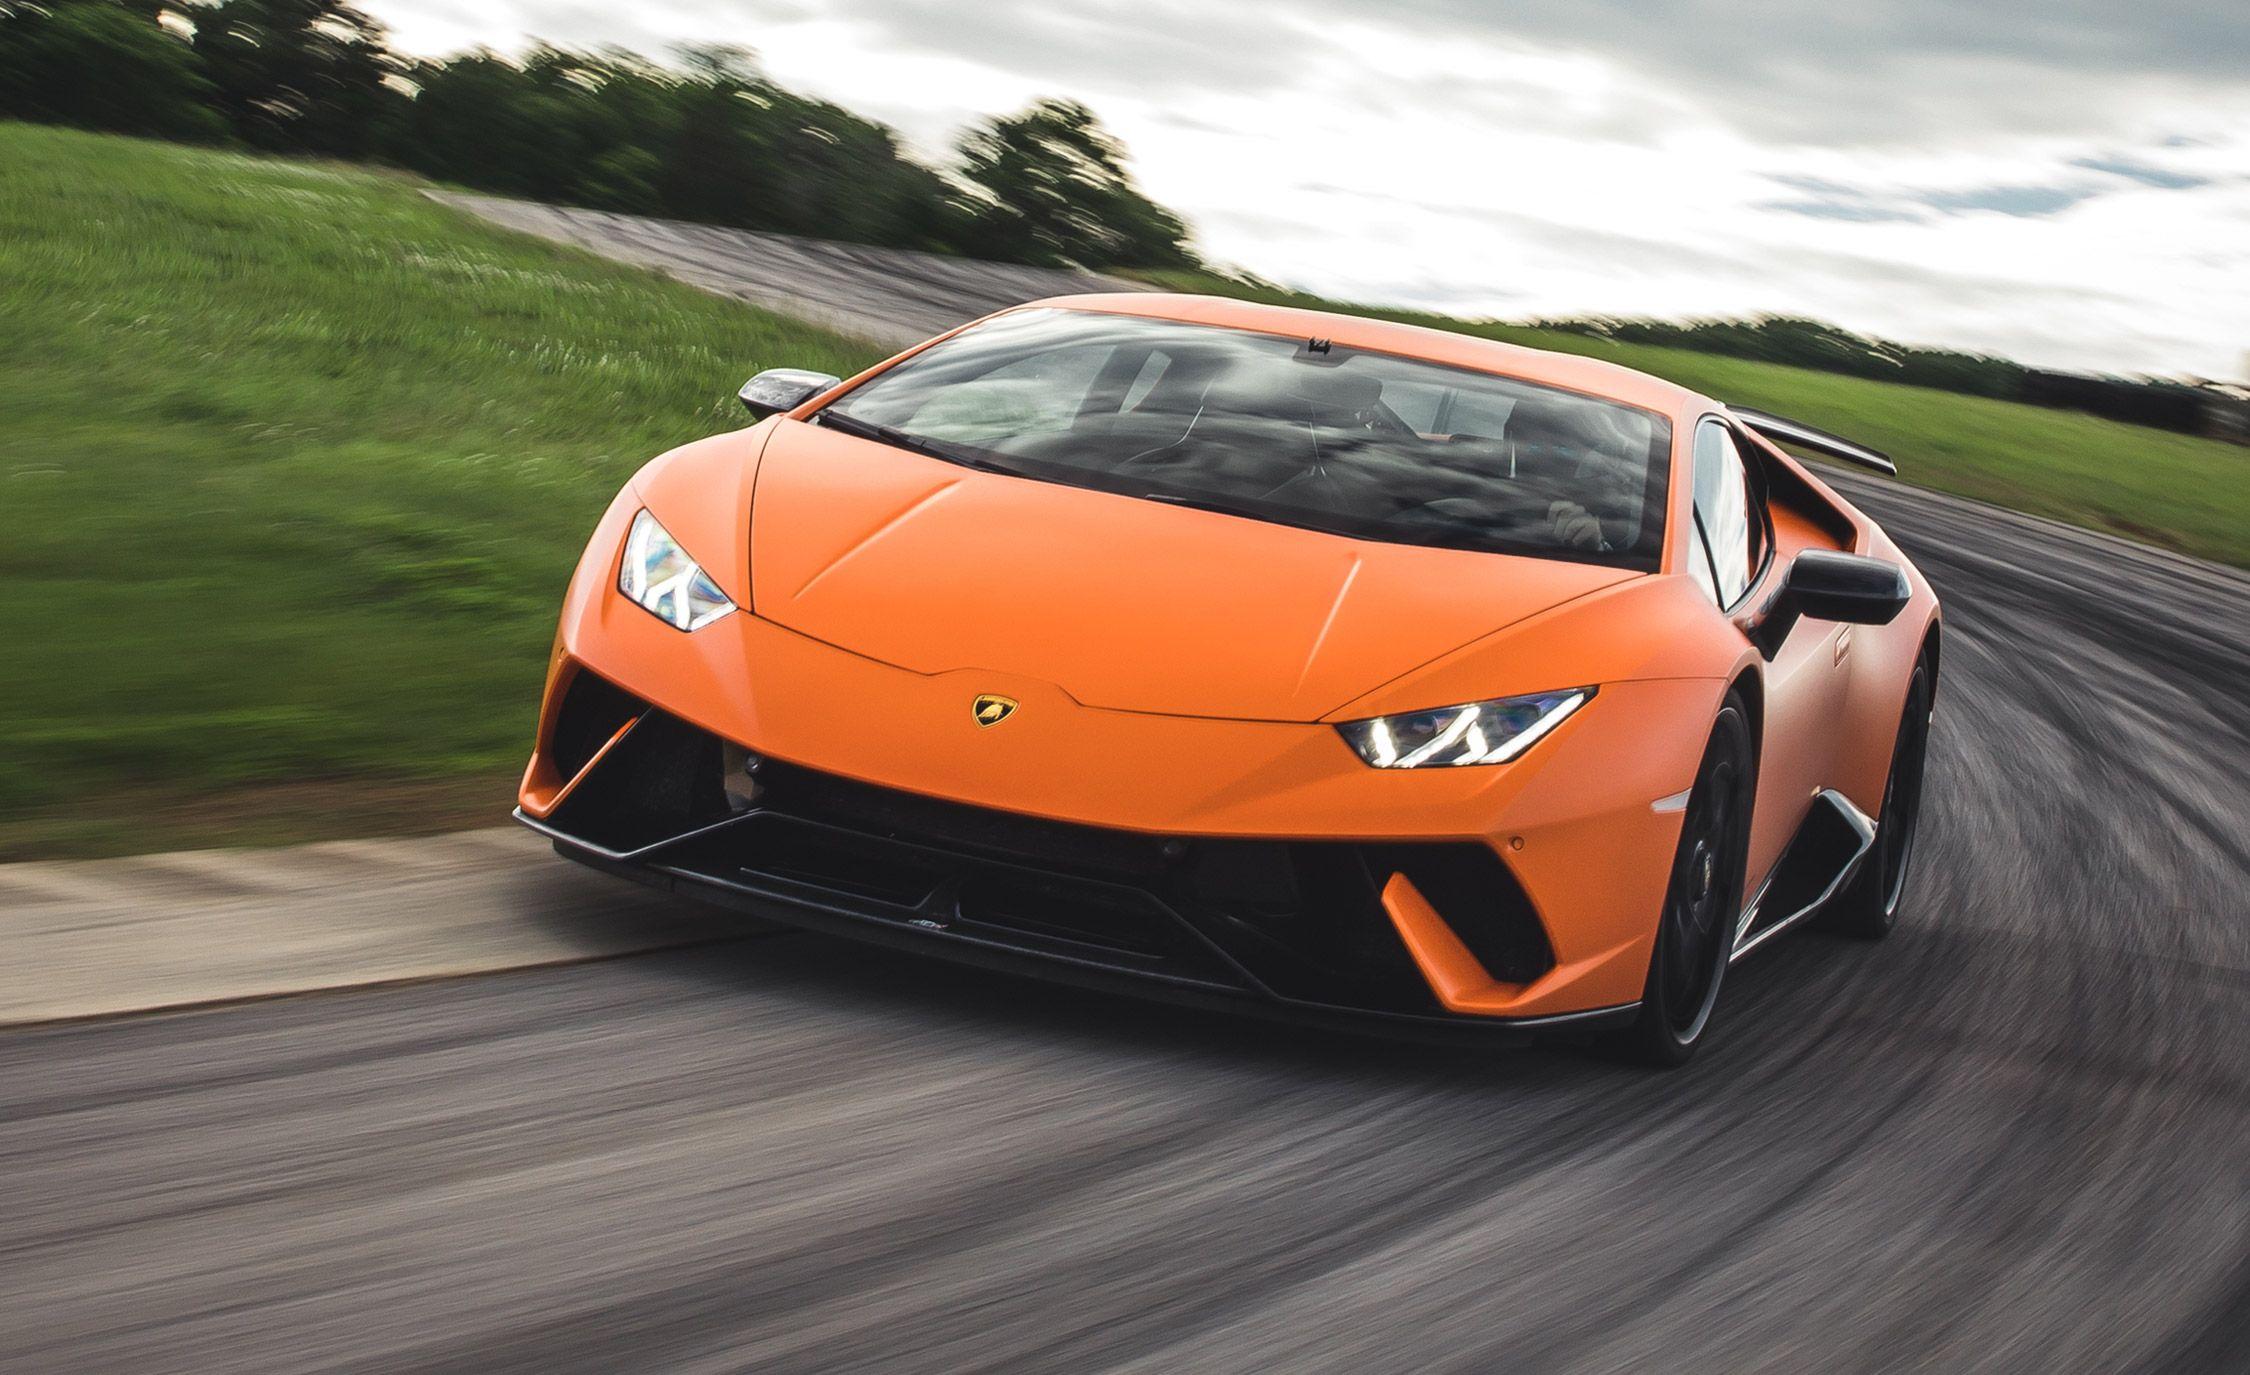 2019 Lamborghini Huracan Reviews Lamborghini Huracan Price Photos